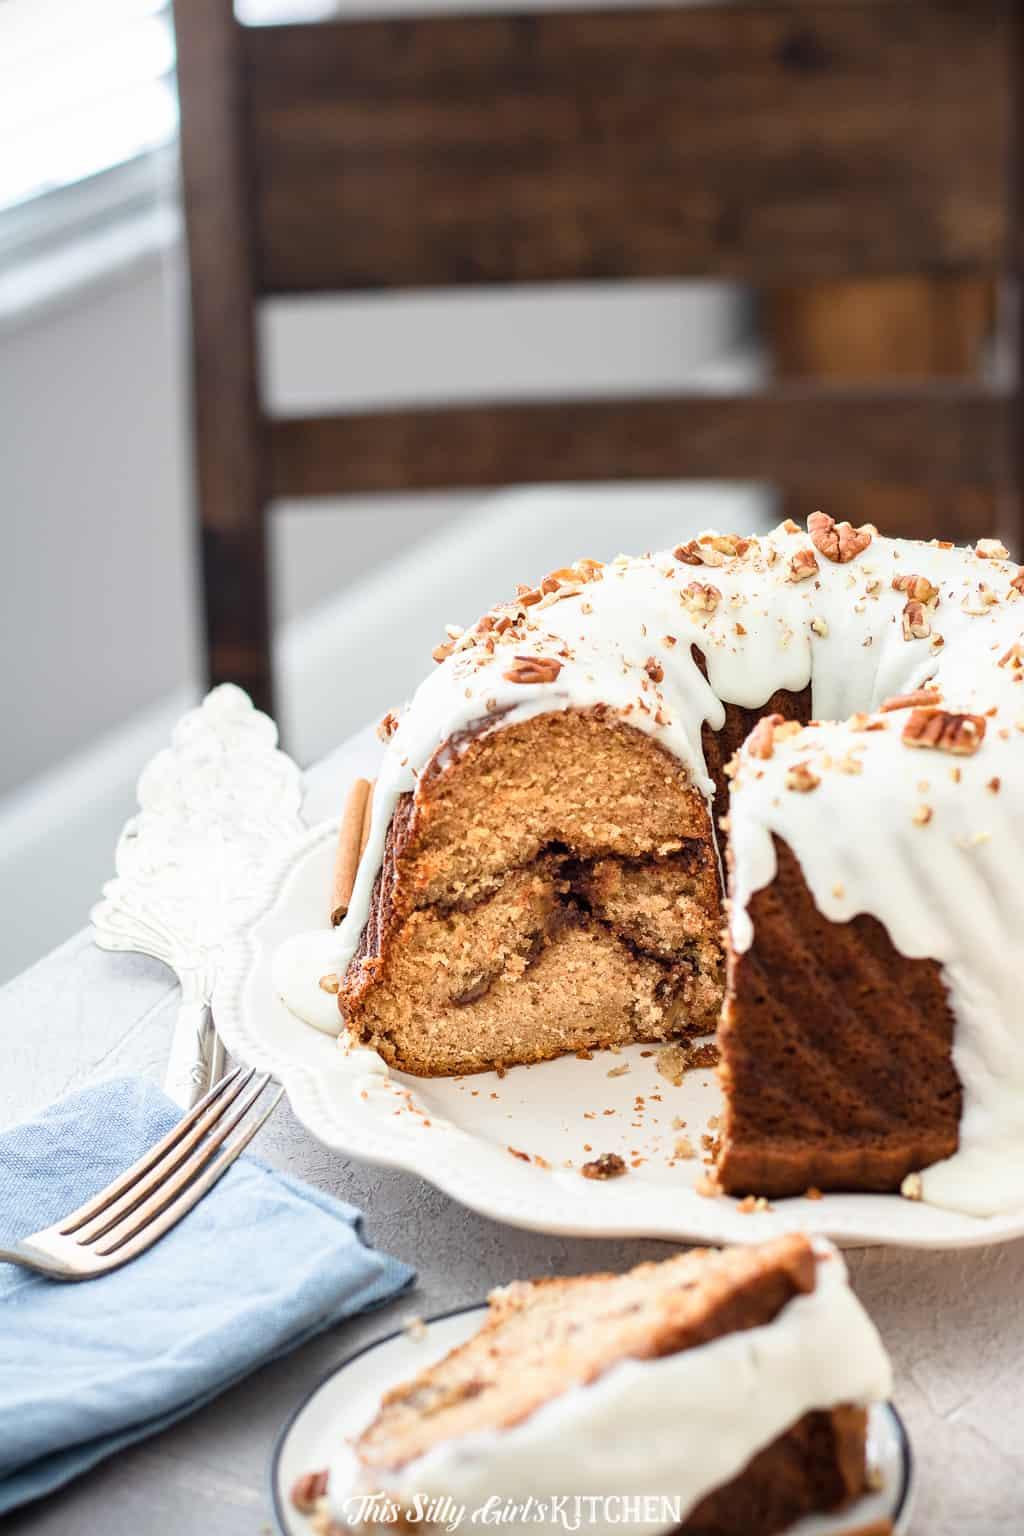 Sliced cinnamon coffee cake